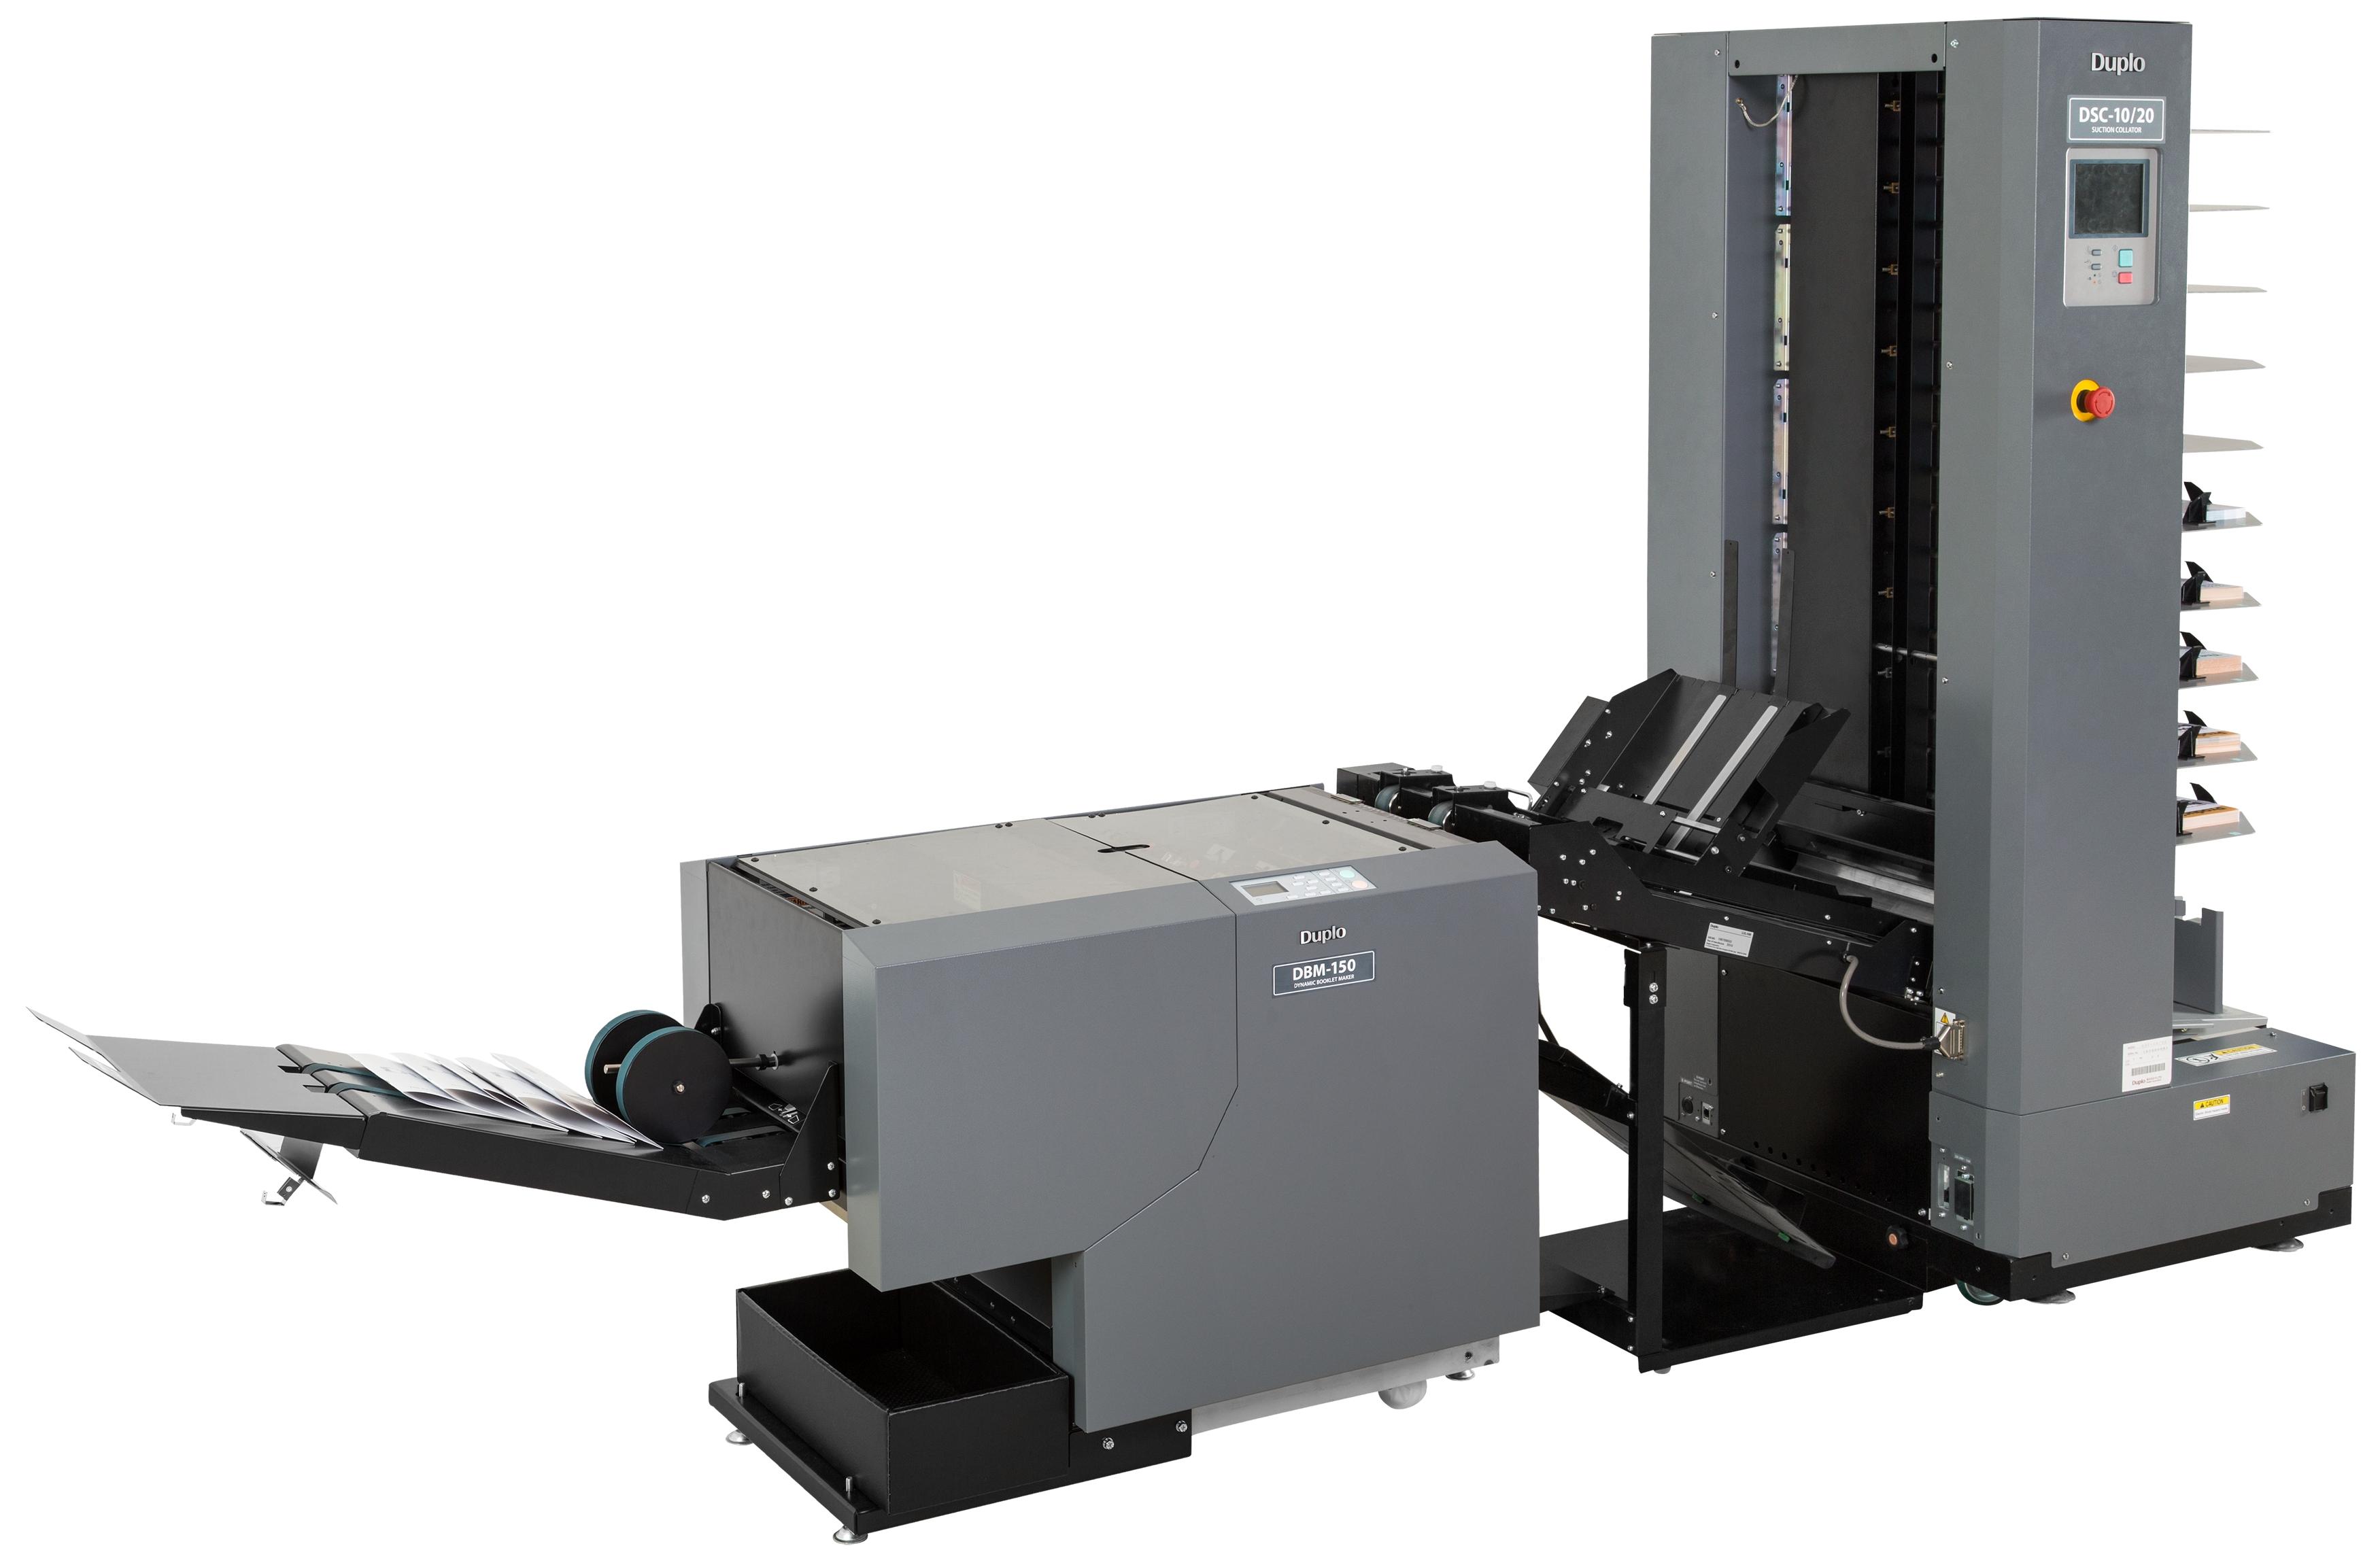 System 150